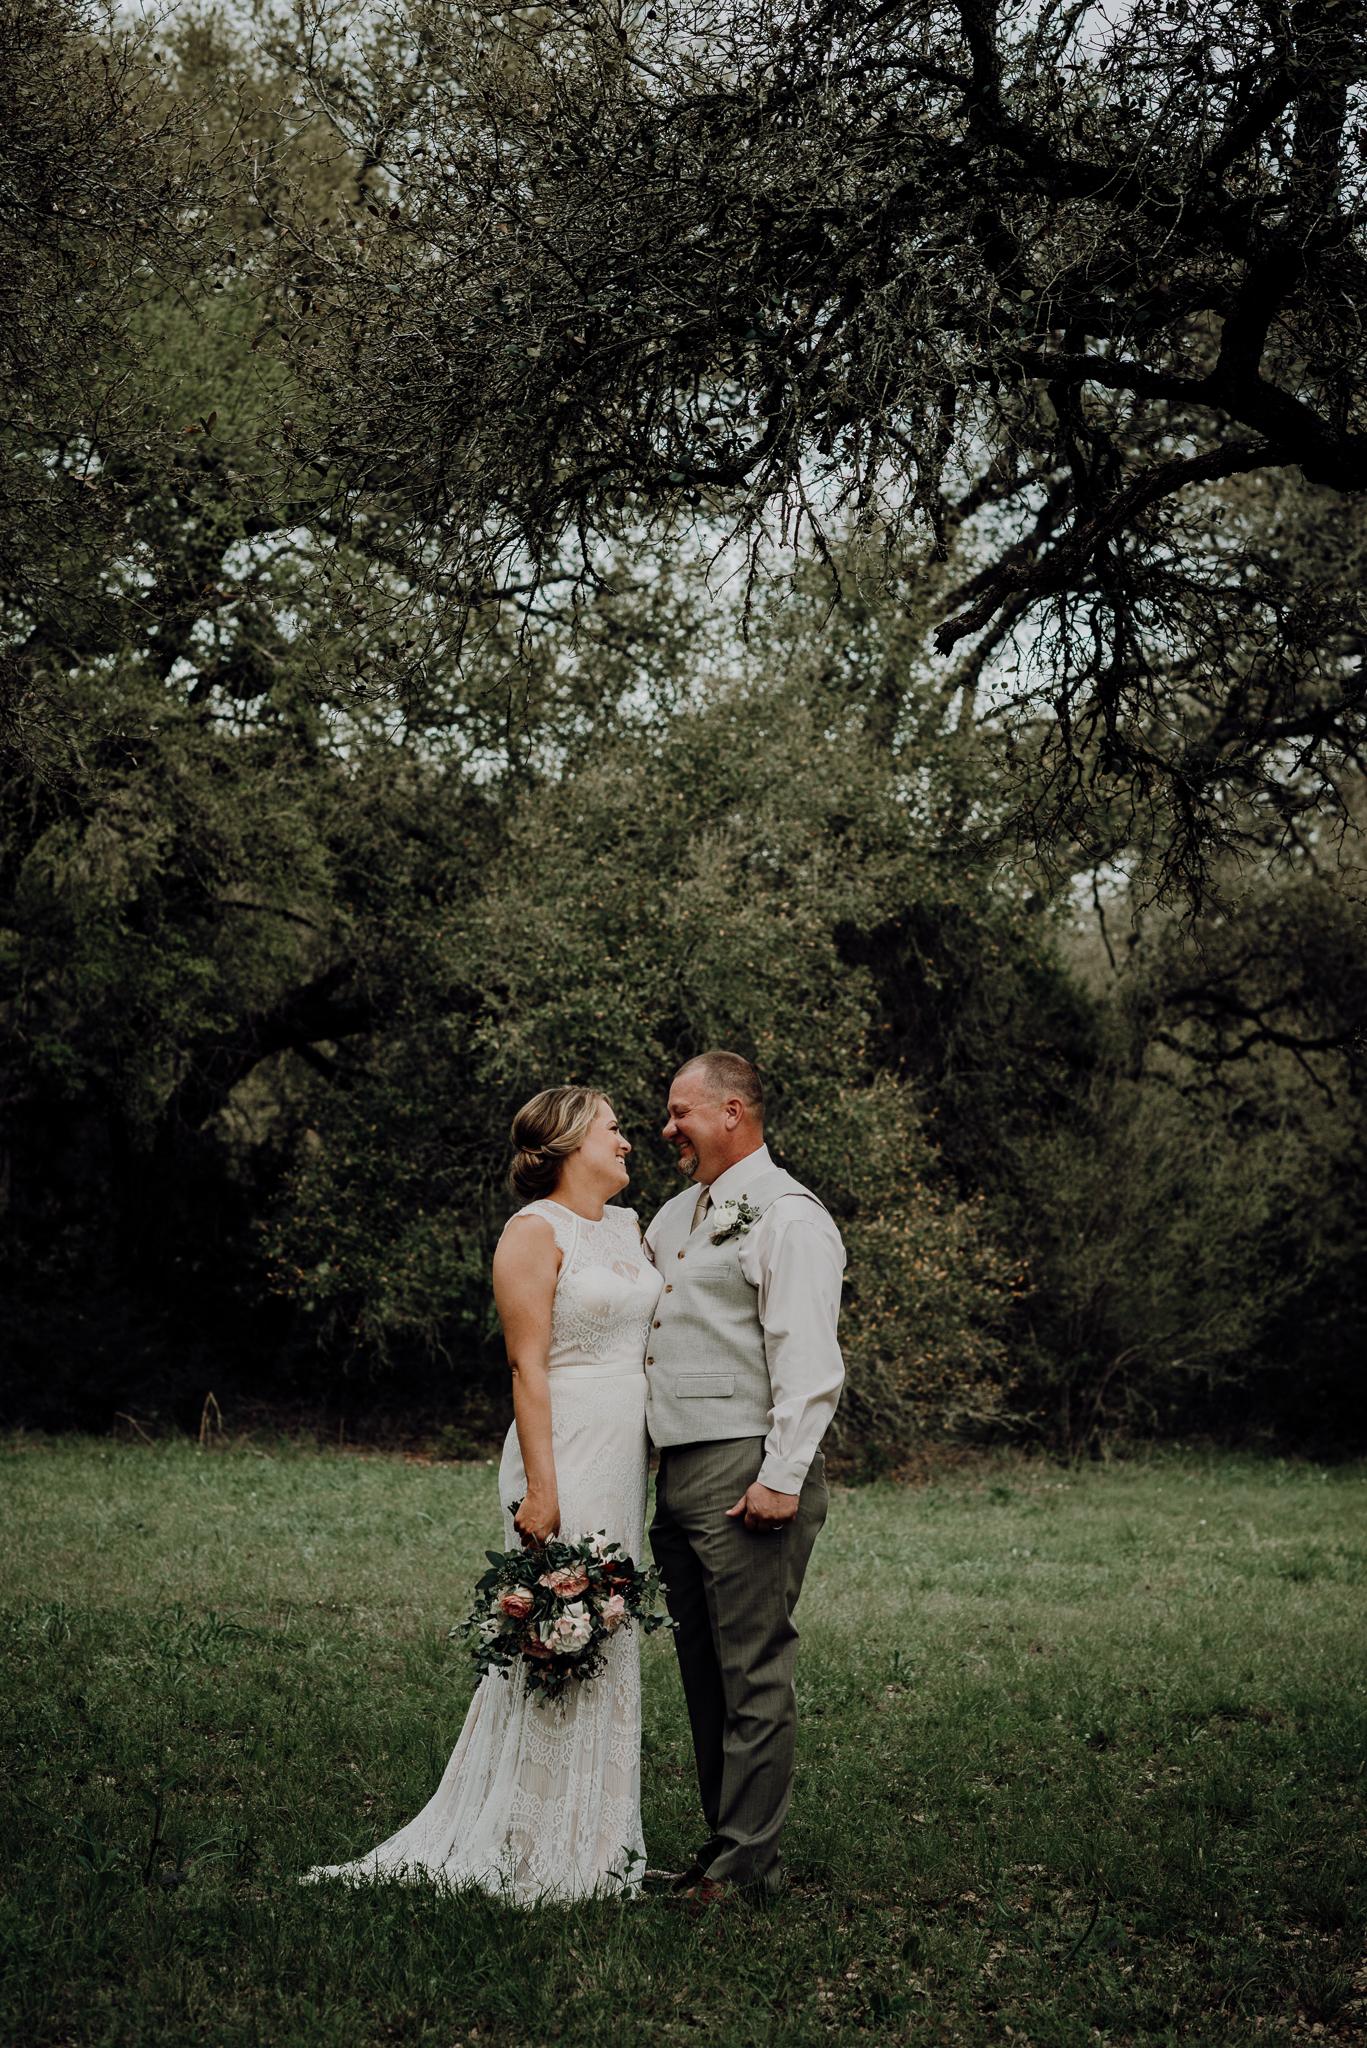 kristen giles photography | texas-wedding-elopement-photographer-Duchman Winery-Austin TX-22-blog.jpg